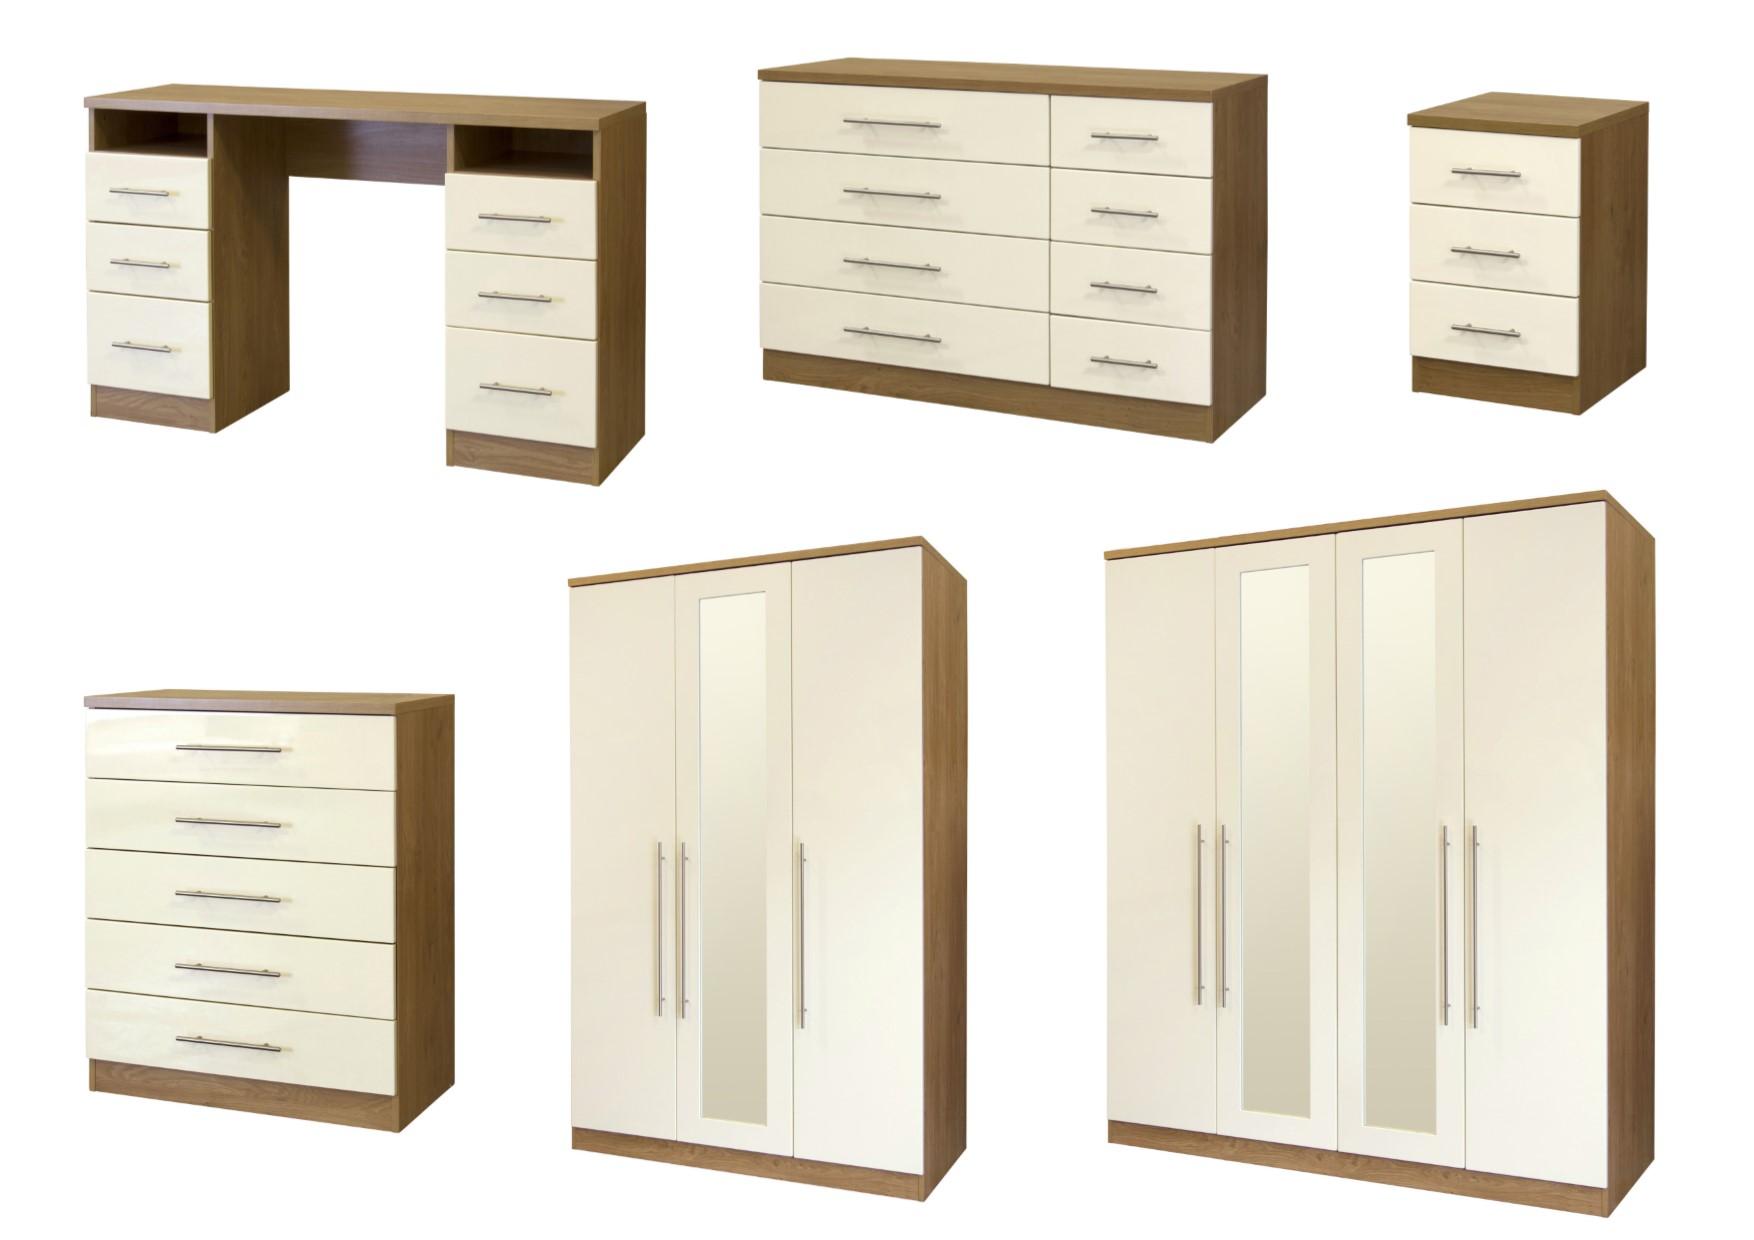 keswick high gloss cream oak bedroom furniture wardrobe drawers bedside ebay. Black Bedroom Furniture Sets. Home Design Ideas